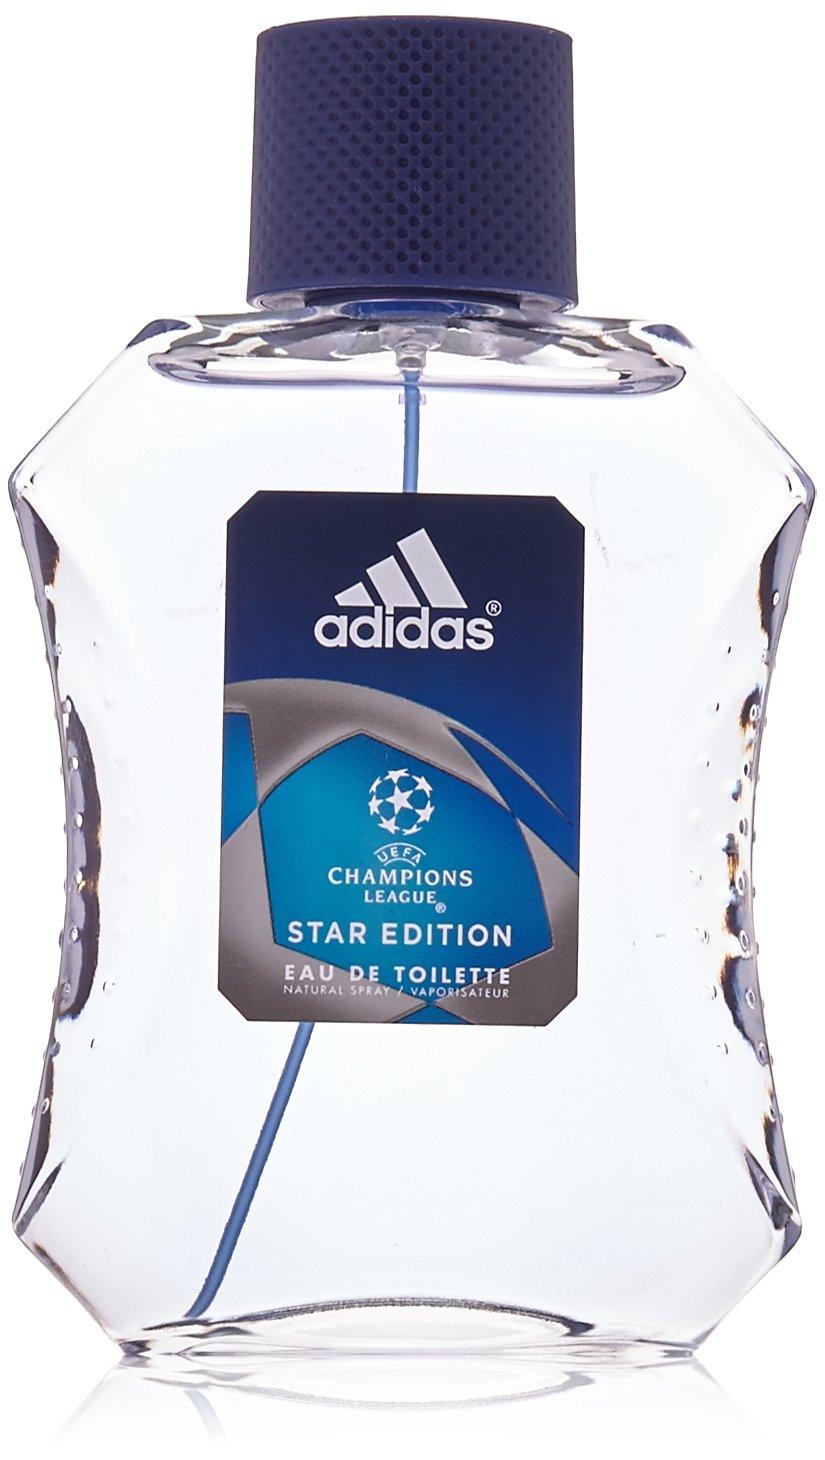 : Adidas UEFA Champions League Star Edition Eau